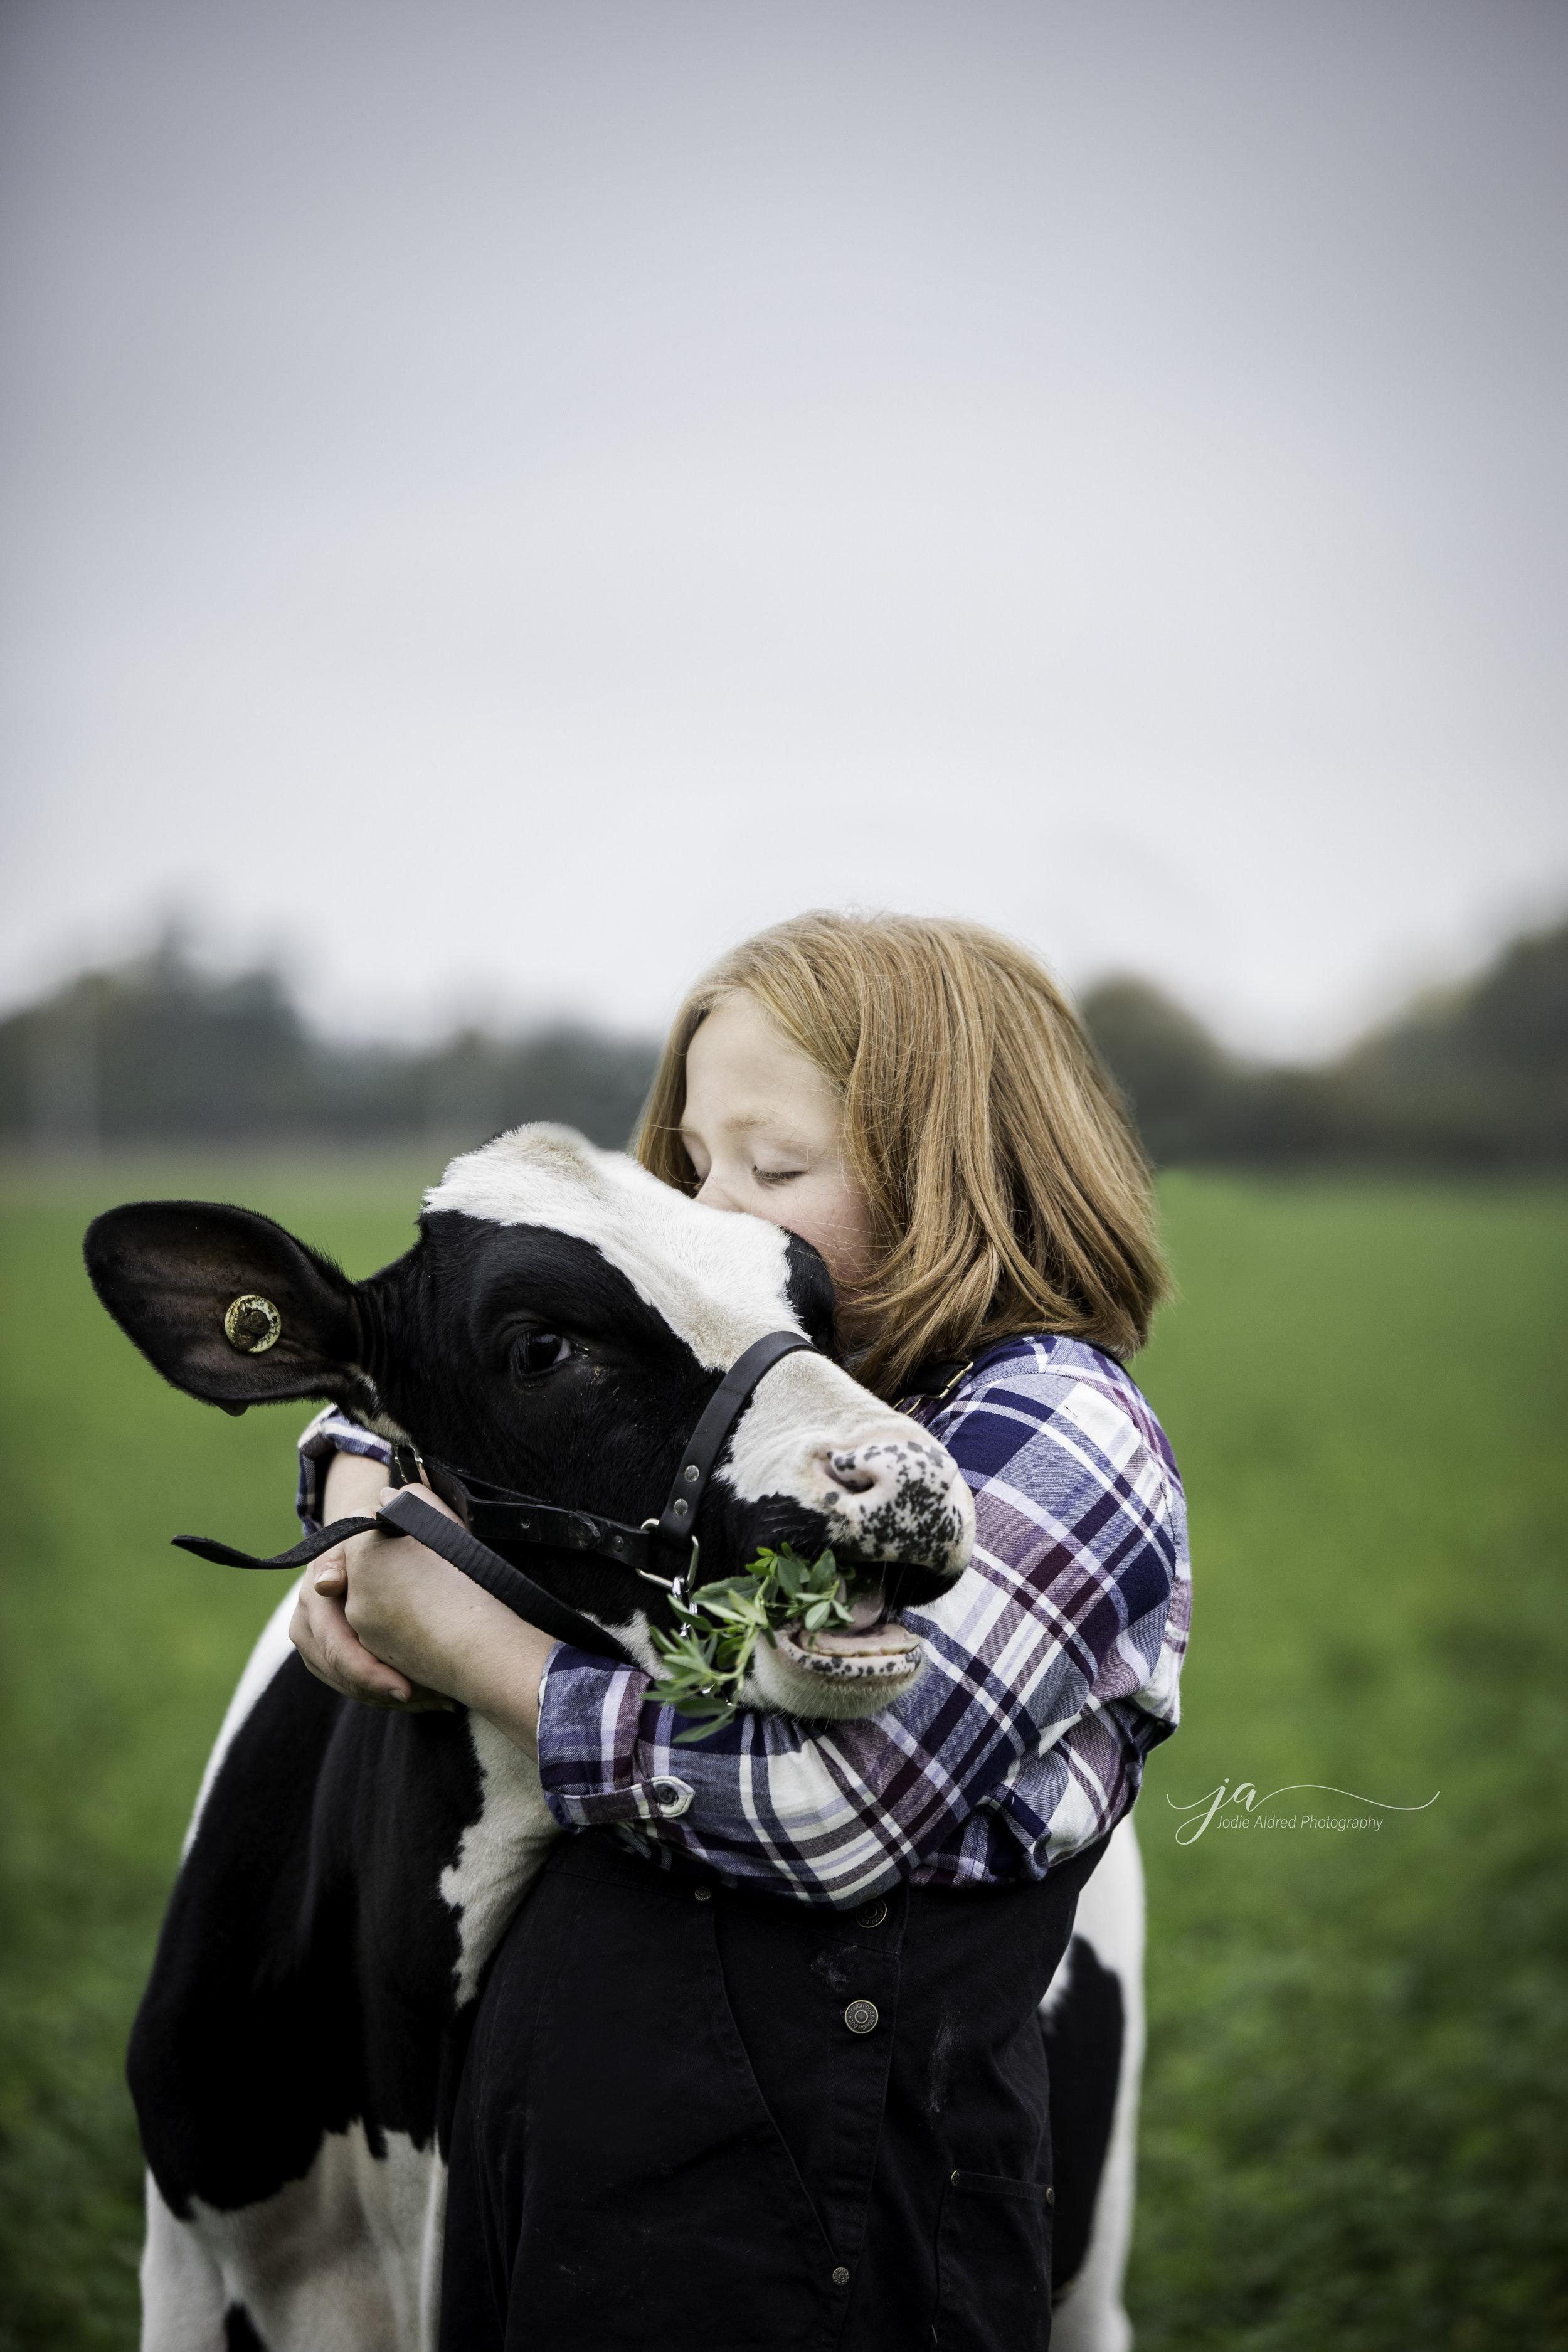 Farming_Agriculture_Dairy_Jodie_Aldred_Landscape.jpg